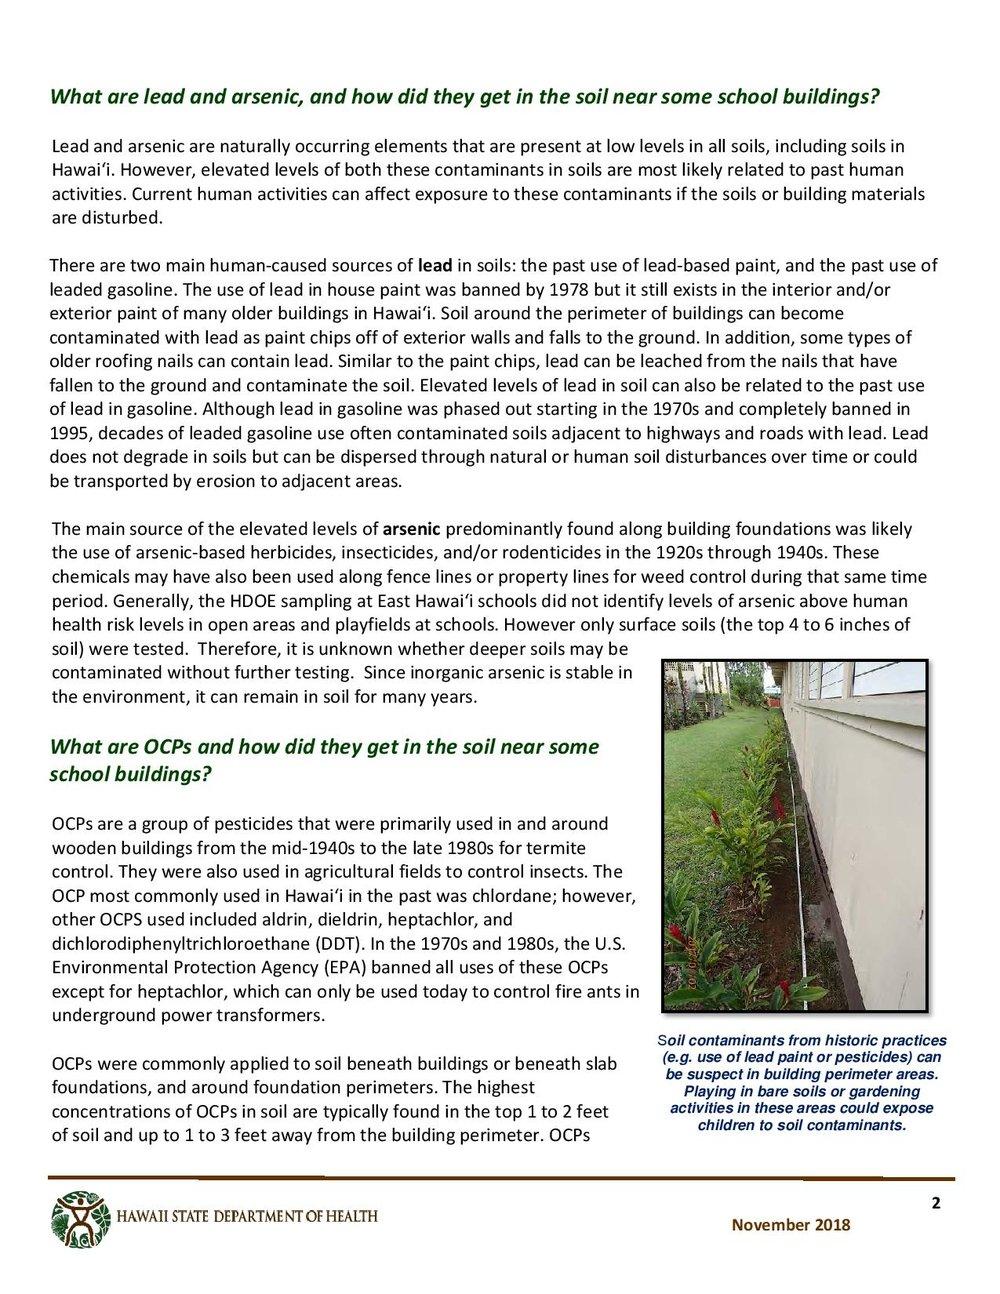 Contaminated Soils Schools Fact Sheet-page-002.jpg